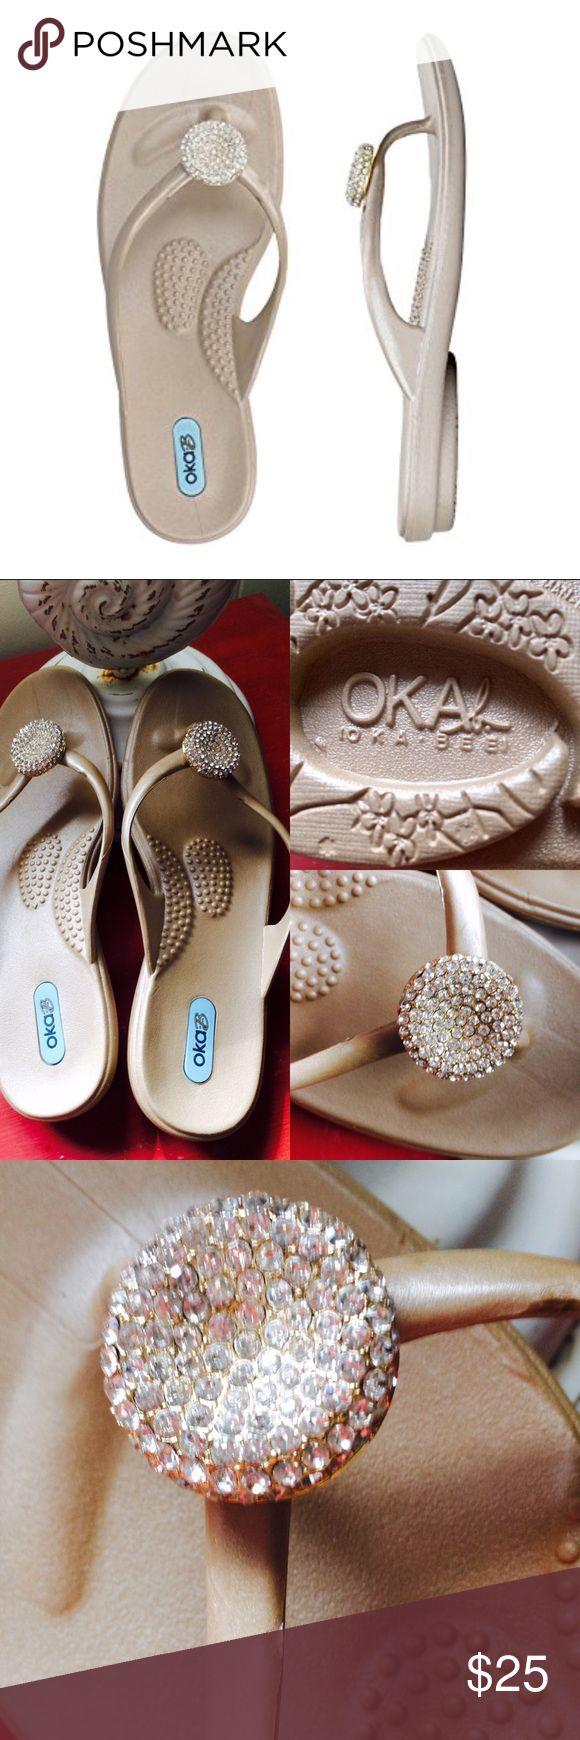 Oka-b Crystal Thong Flip Flops- Medium - NEW Oka-b Crystal Thong Flip Flops- Size Medium- fits size 7 to 8 - New, never worn- cream color Oka-b Shoes